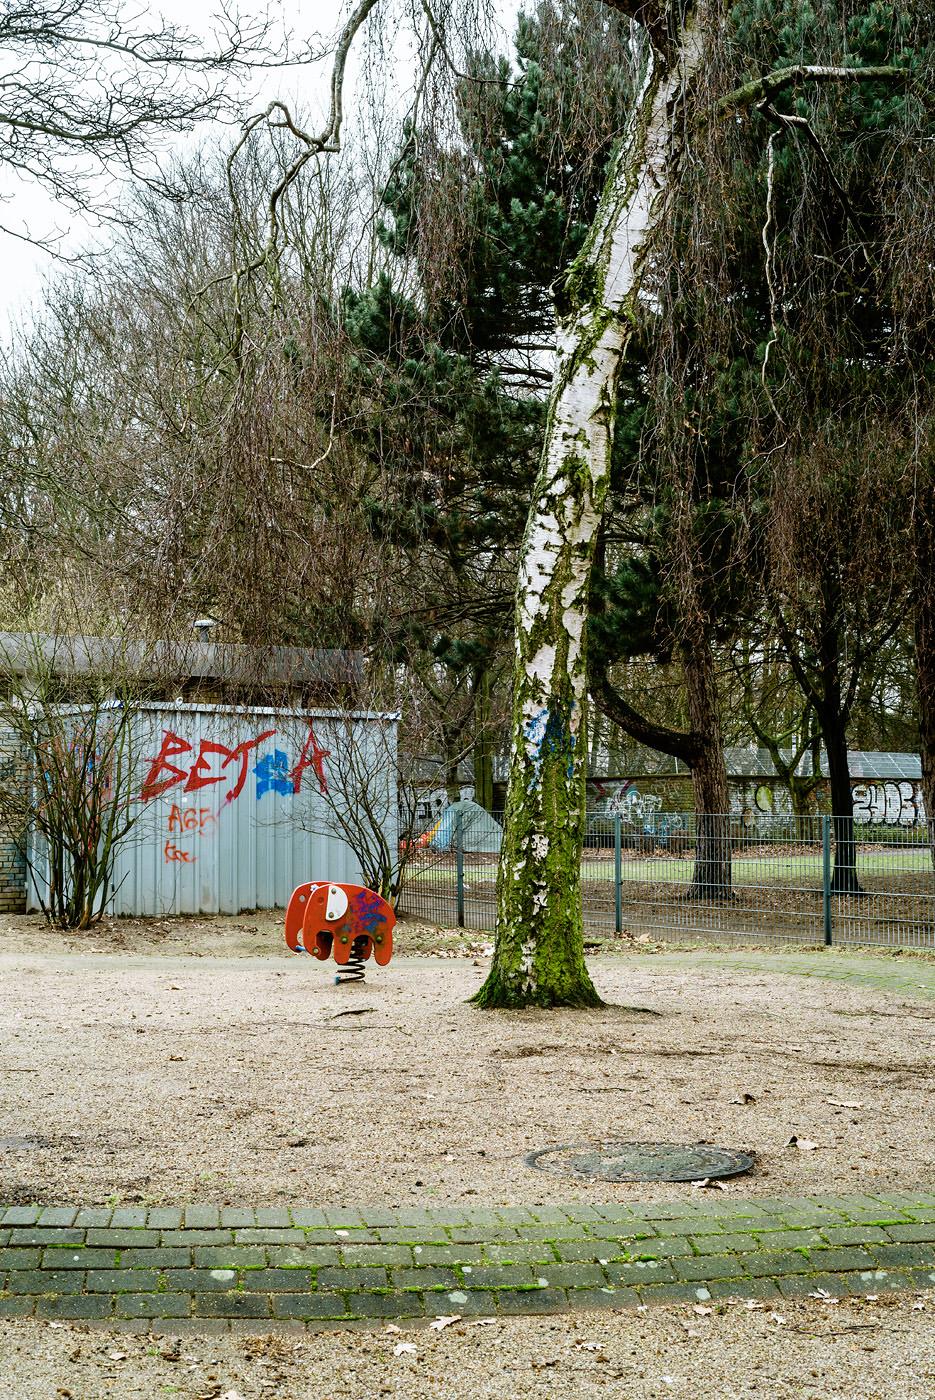 7Spielplatz Königstr-2.jpg